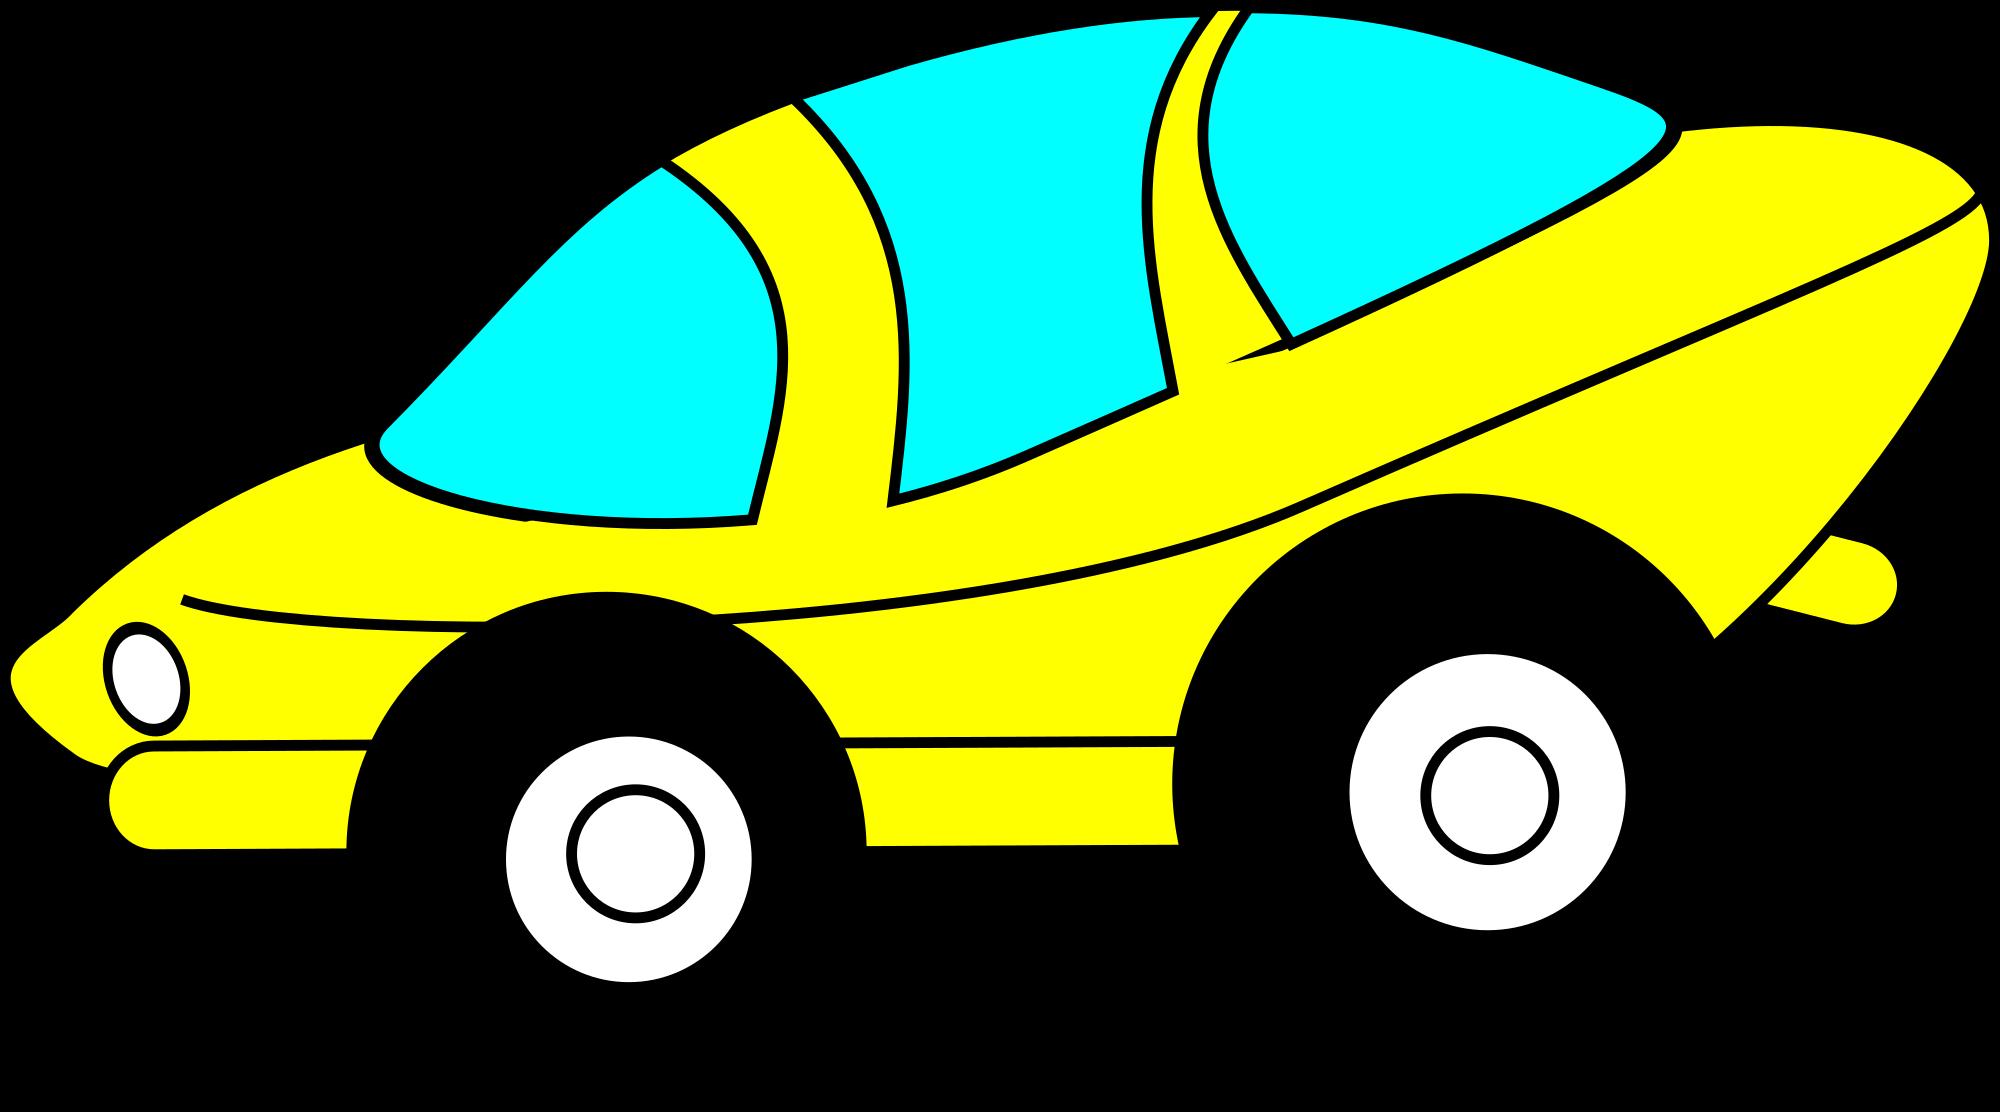 2000x1112 Clipart Cartoon Cars